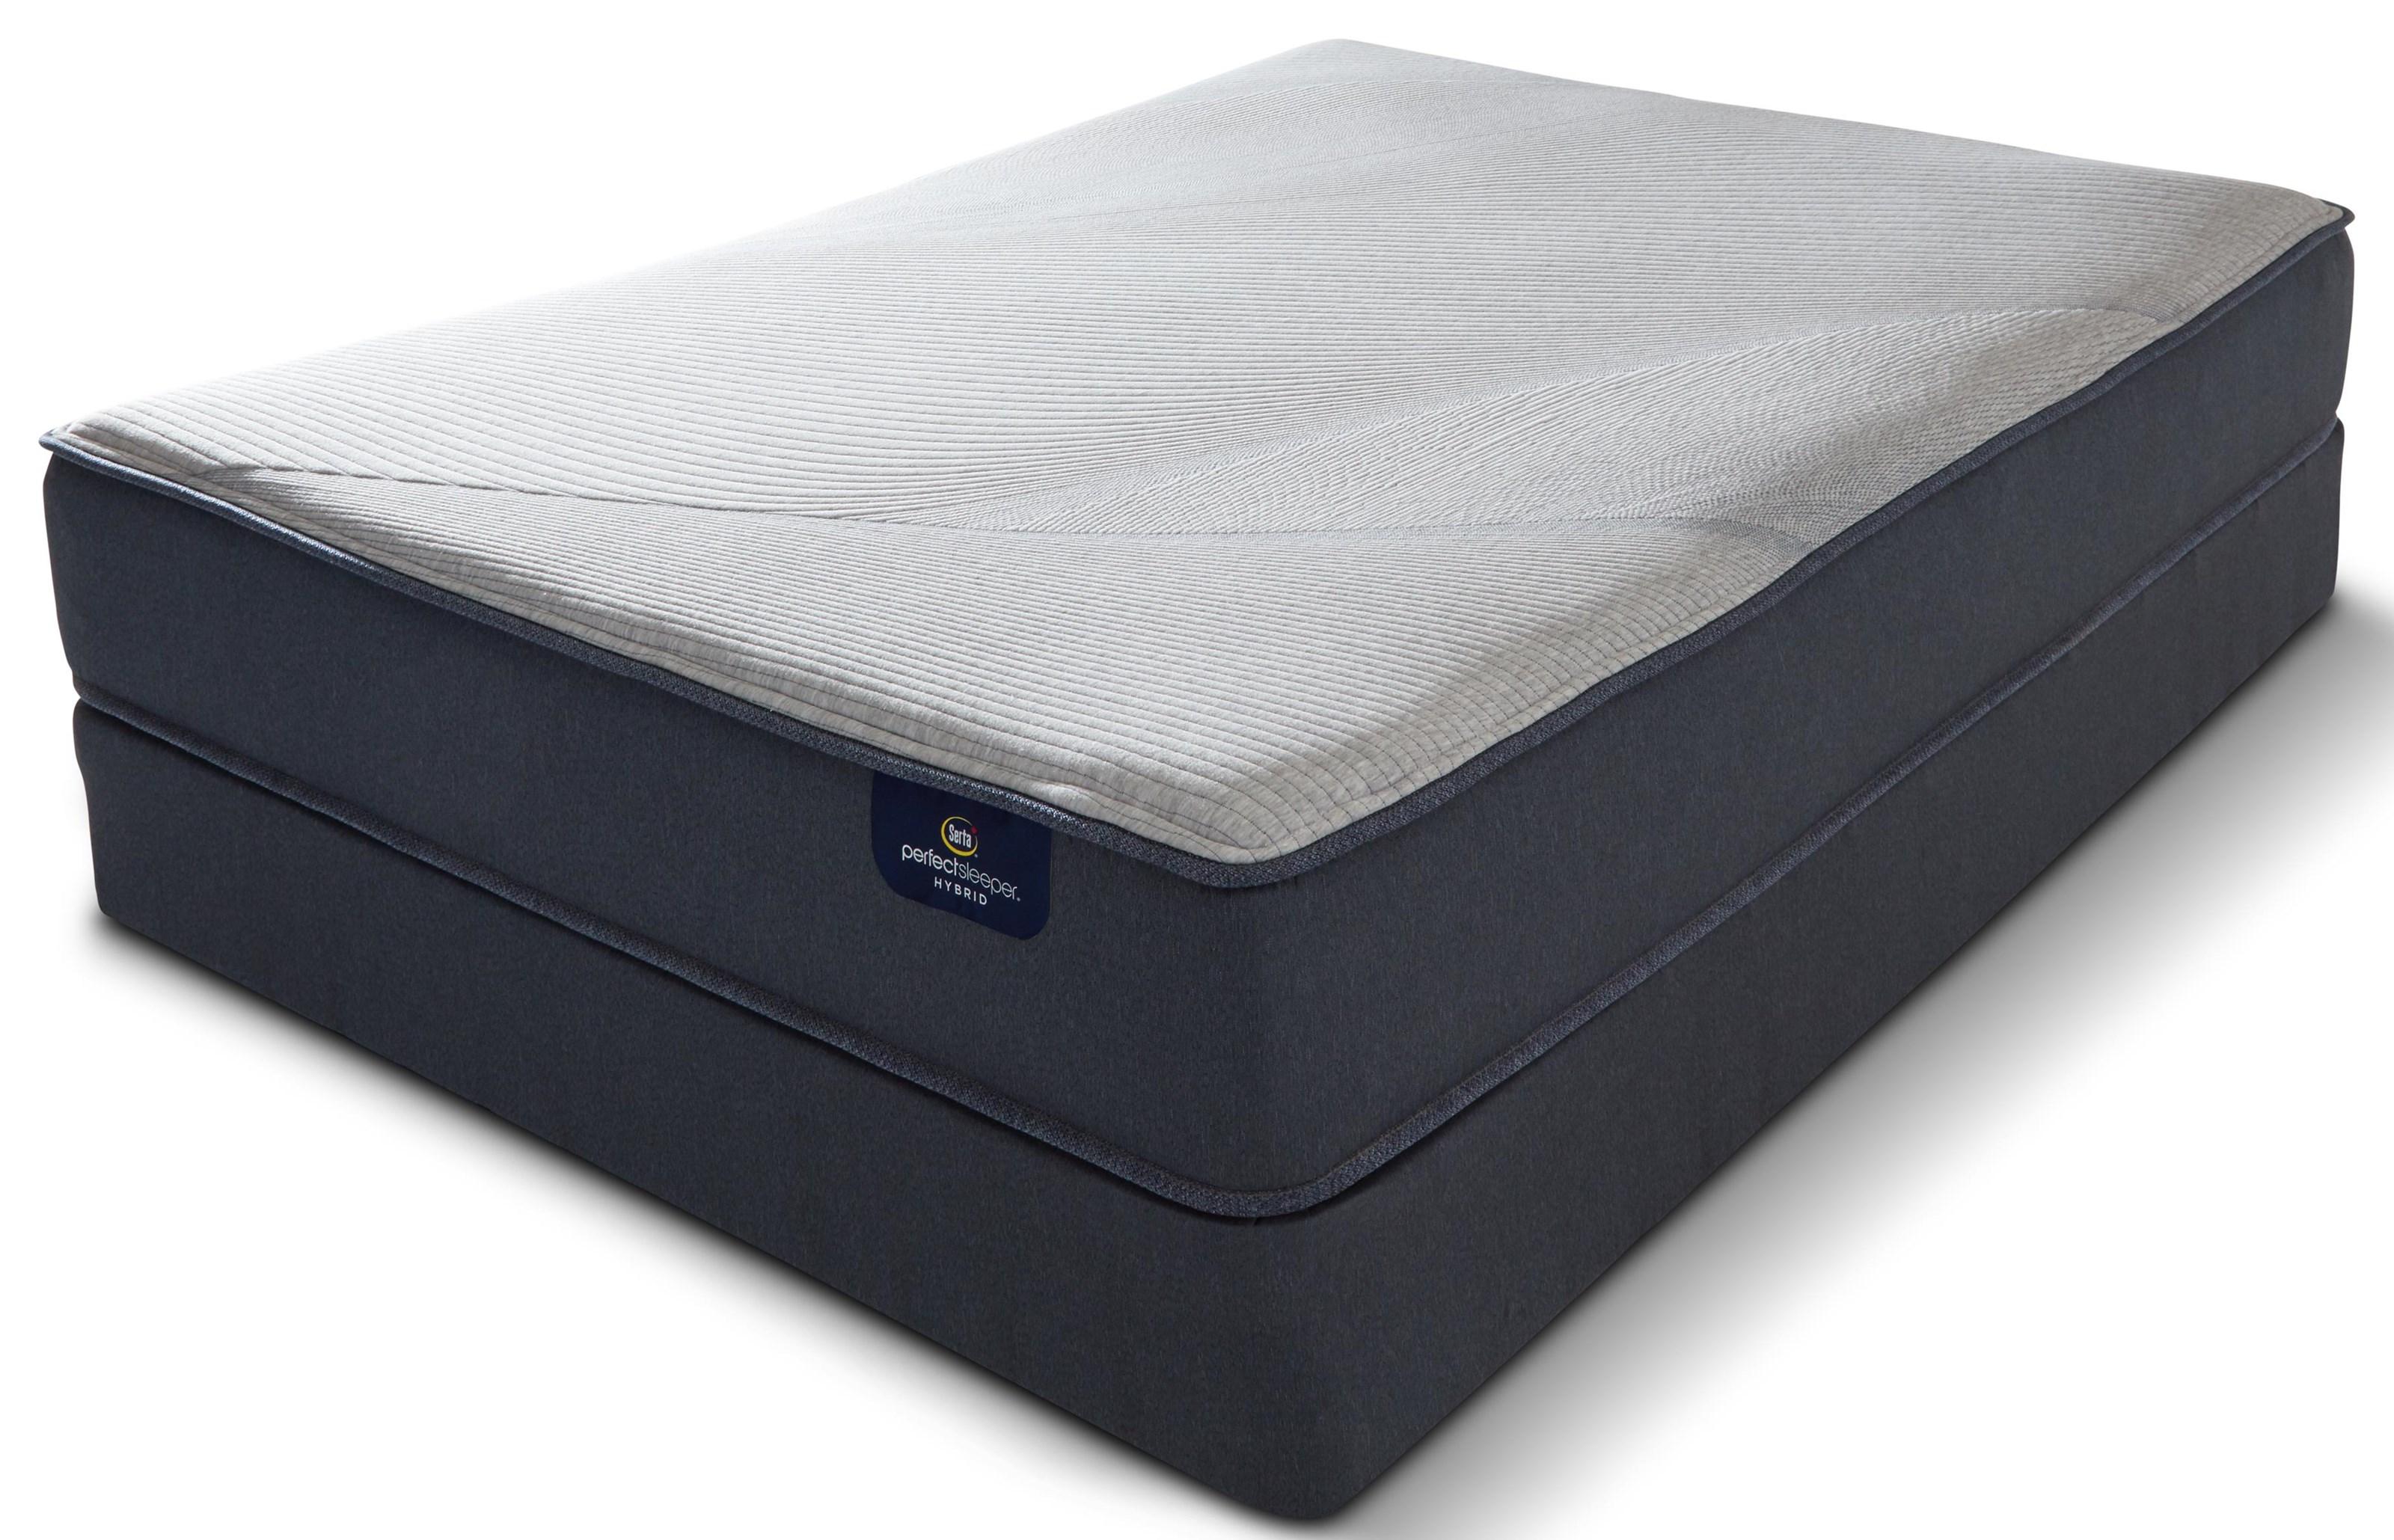 Emery Perfect Sleeper KG EMERY PLW SFT MATTRESS by Serta Canada at Stoney Creek Furniture